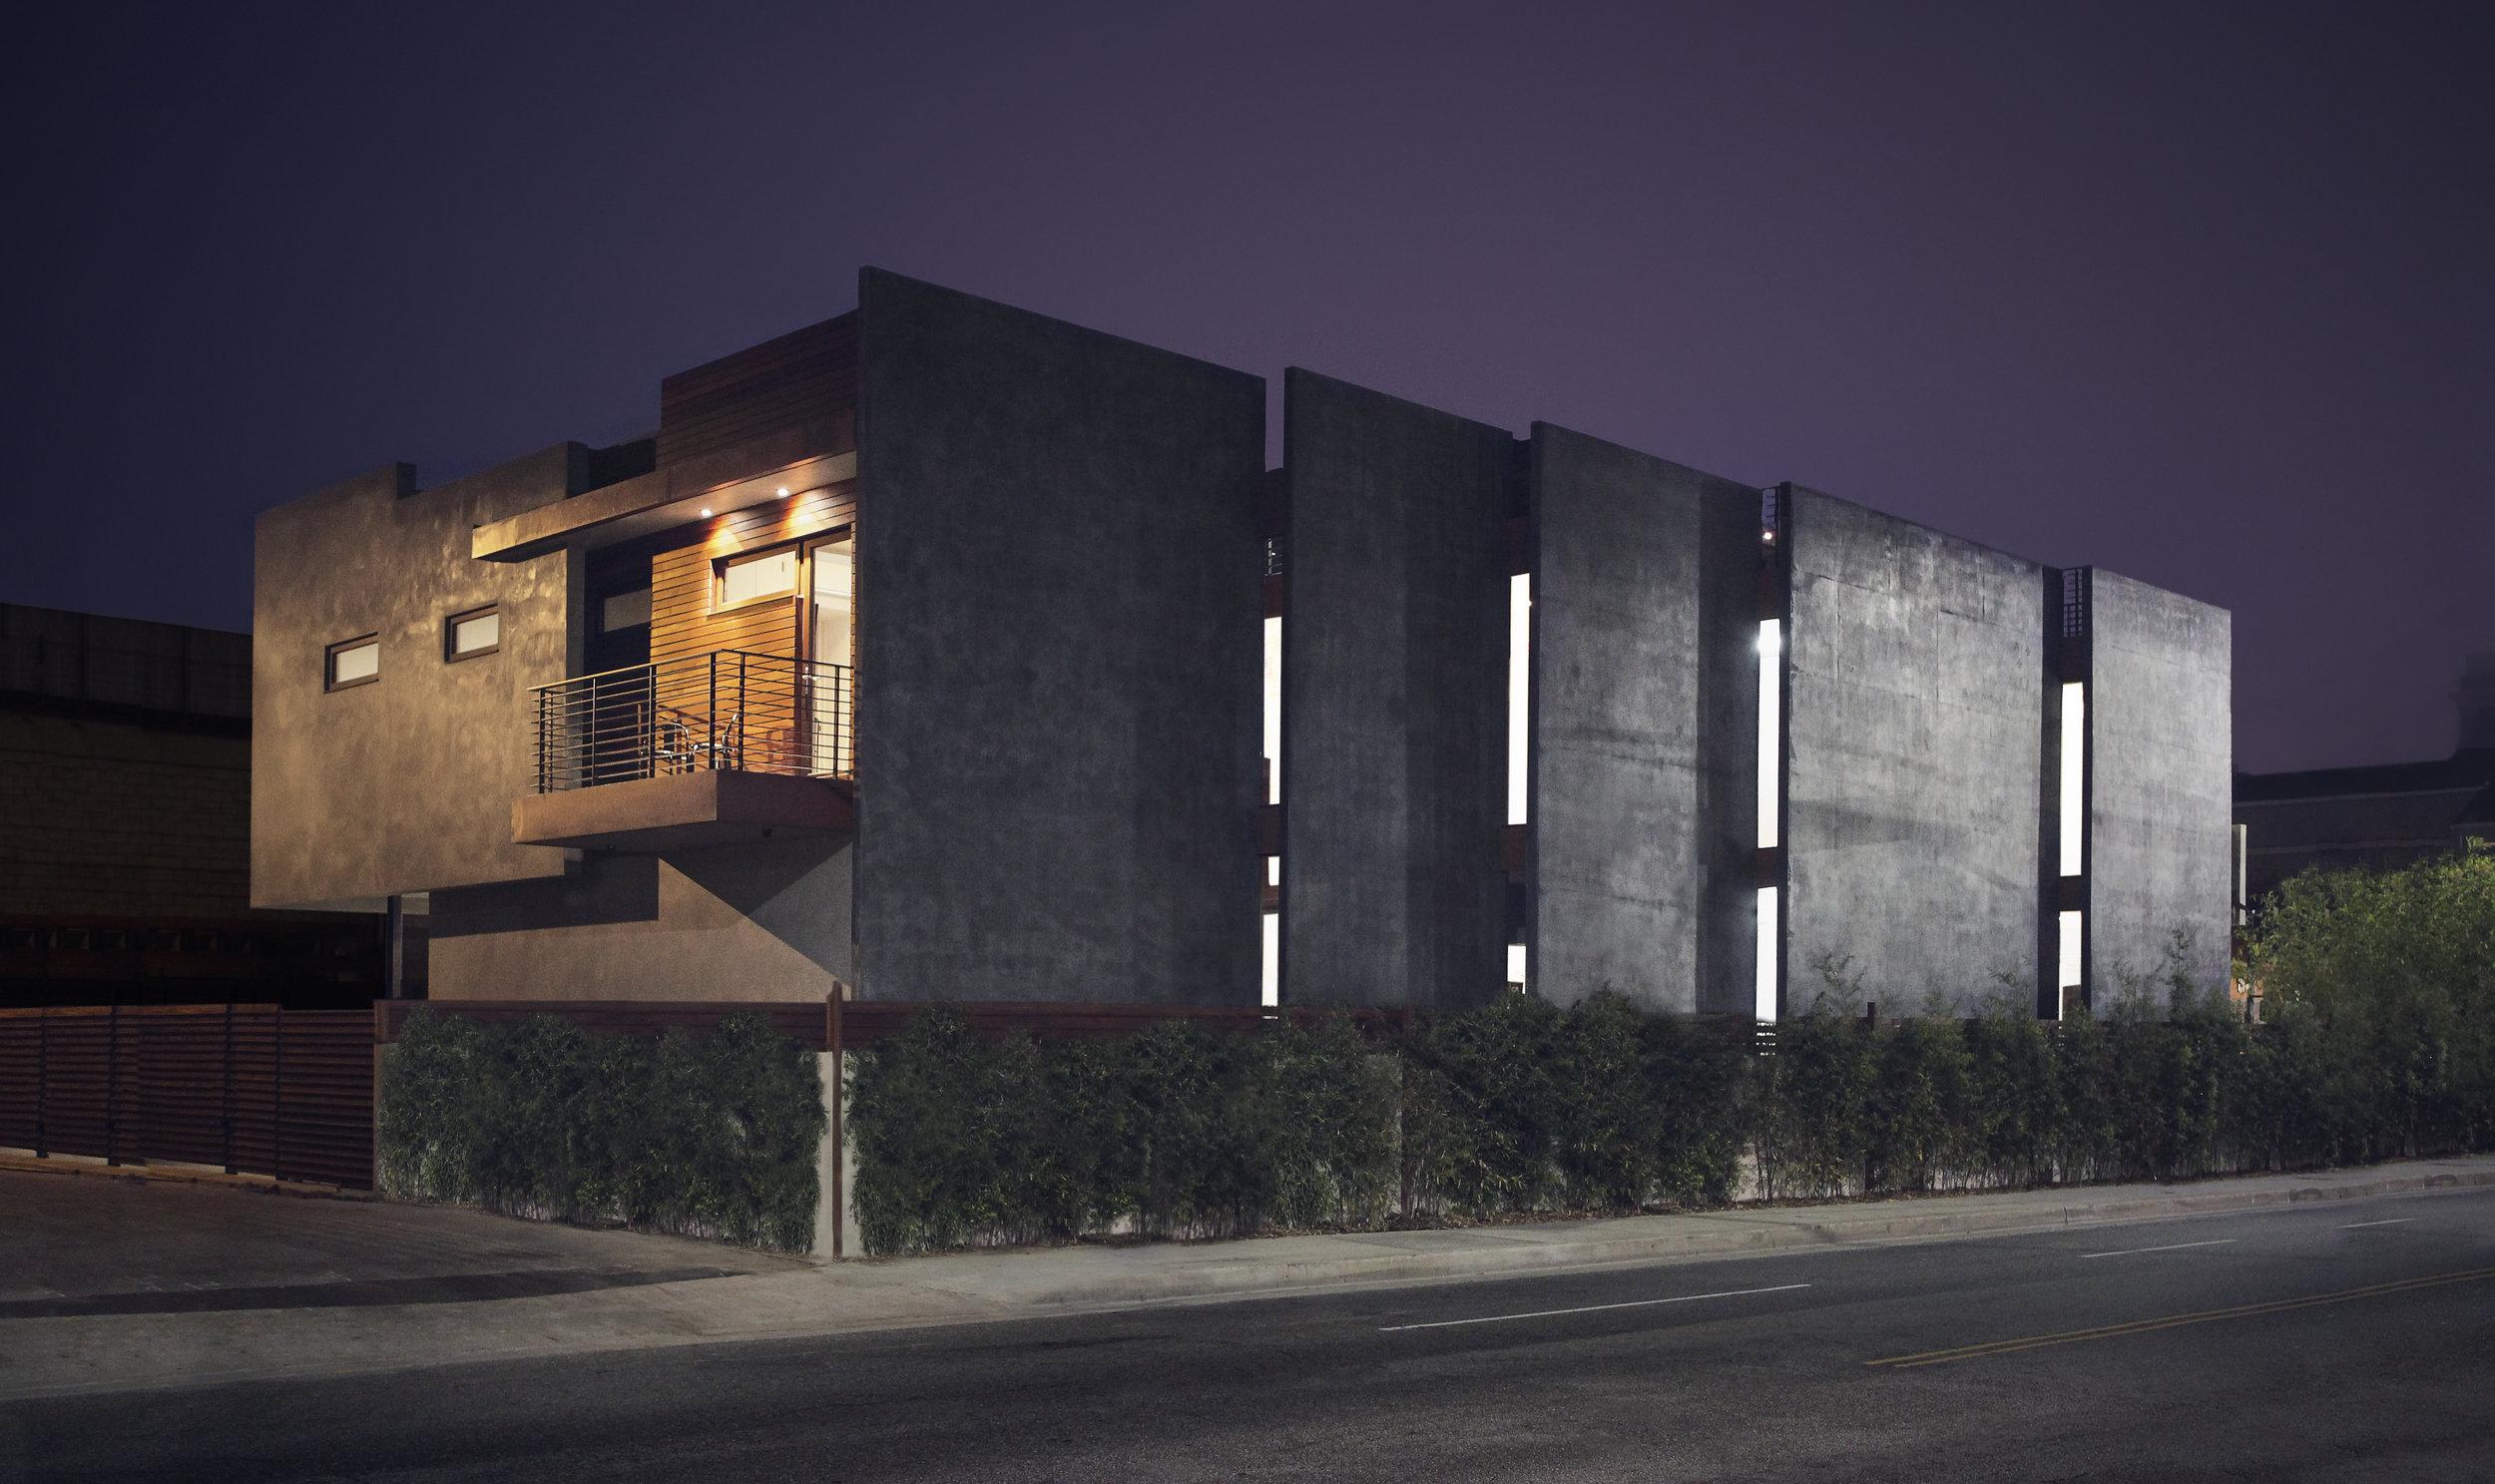 S.E.A.-Studio-Environmental-Architecture-David-Hertz-FAIA-Navy-House-Venice-Beach-California-sustainable-regenerative-restorative-green-design-tilt-up-slab-concrete-courtyard-residential-brutalism-pool-wood-detail-exterior-modern-contemporary-1.jpg